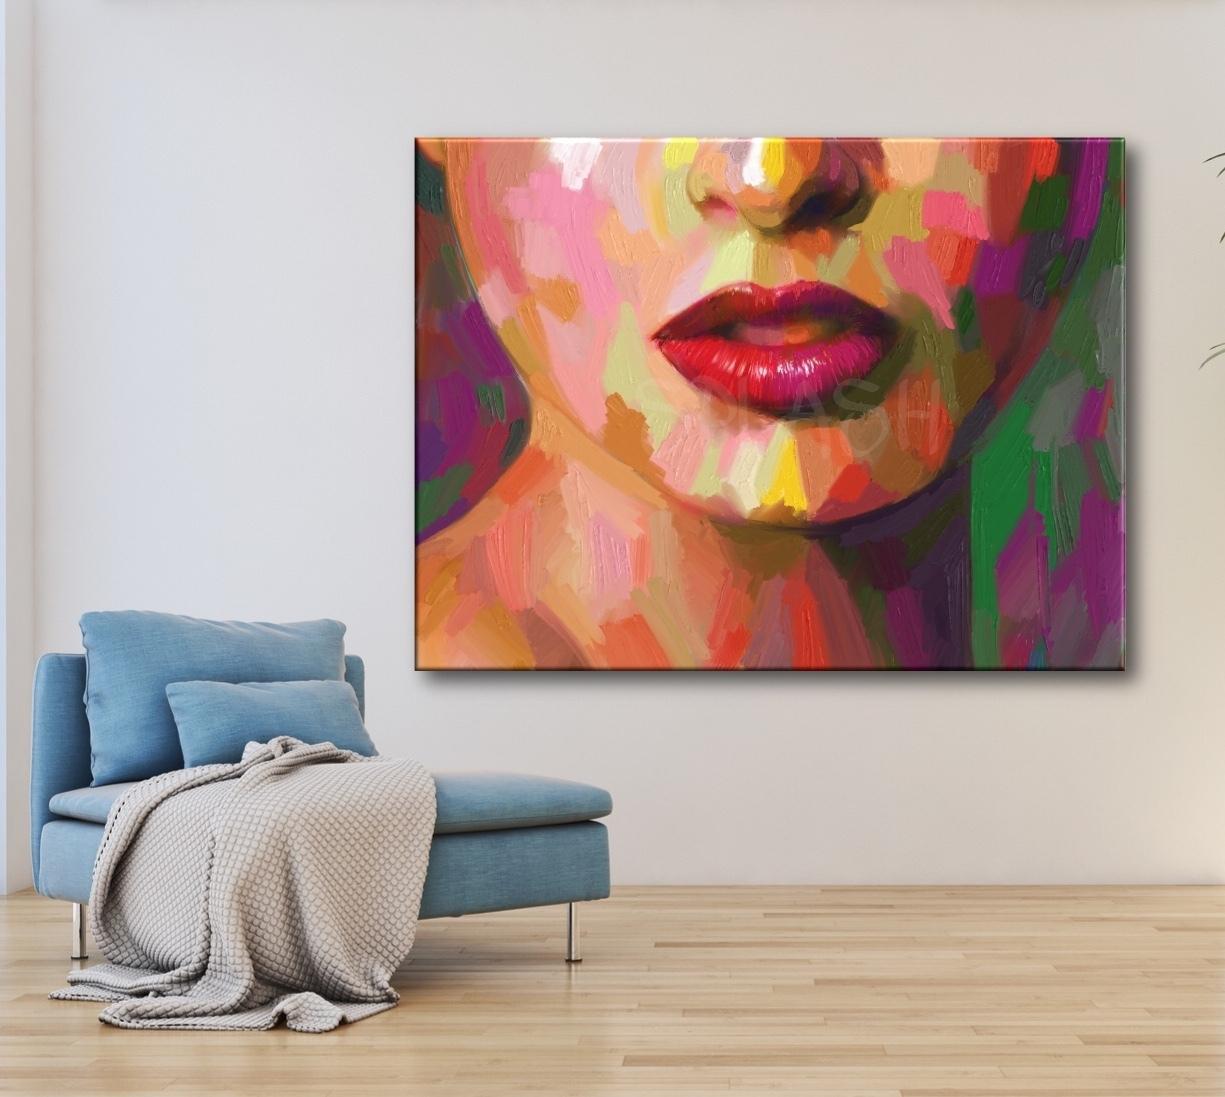 Tiendas de cuadros modernos decorativos cuadros splash Cuadros rectangulares modernos